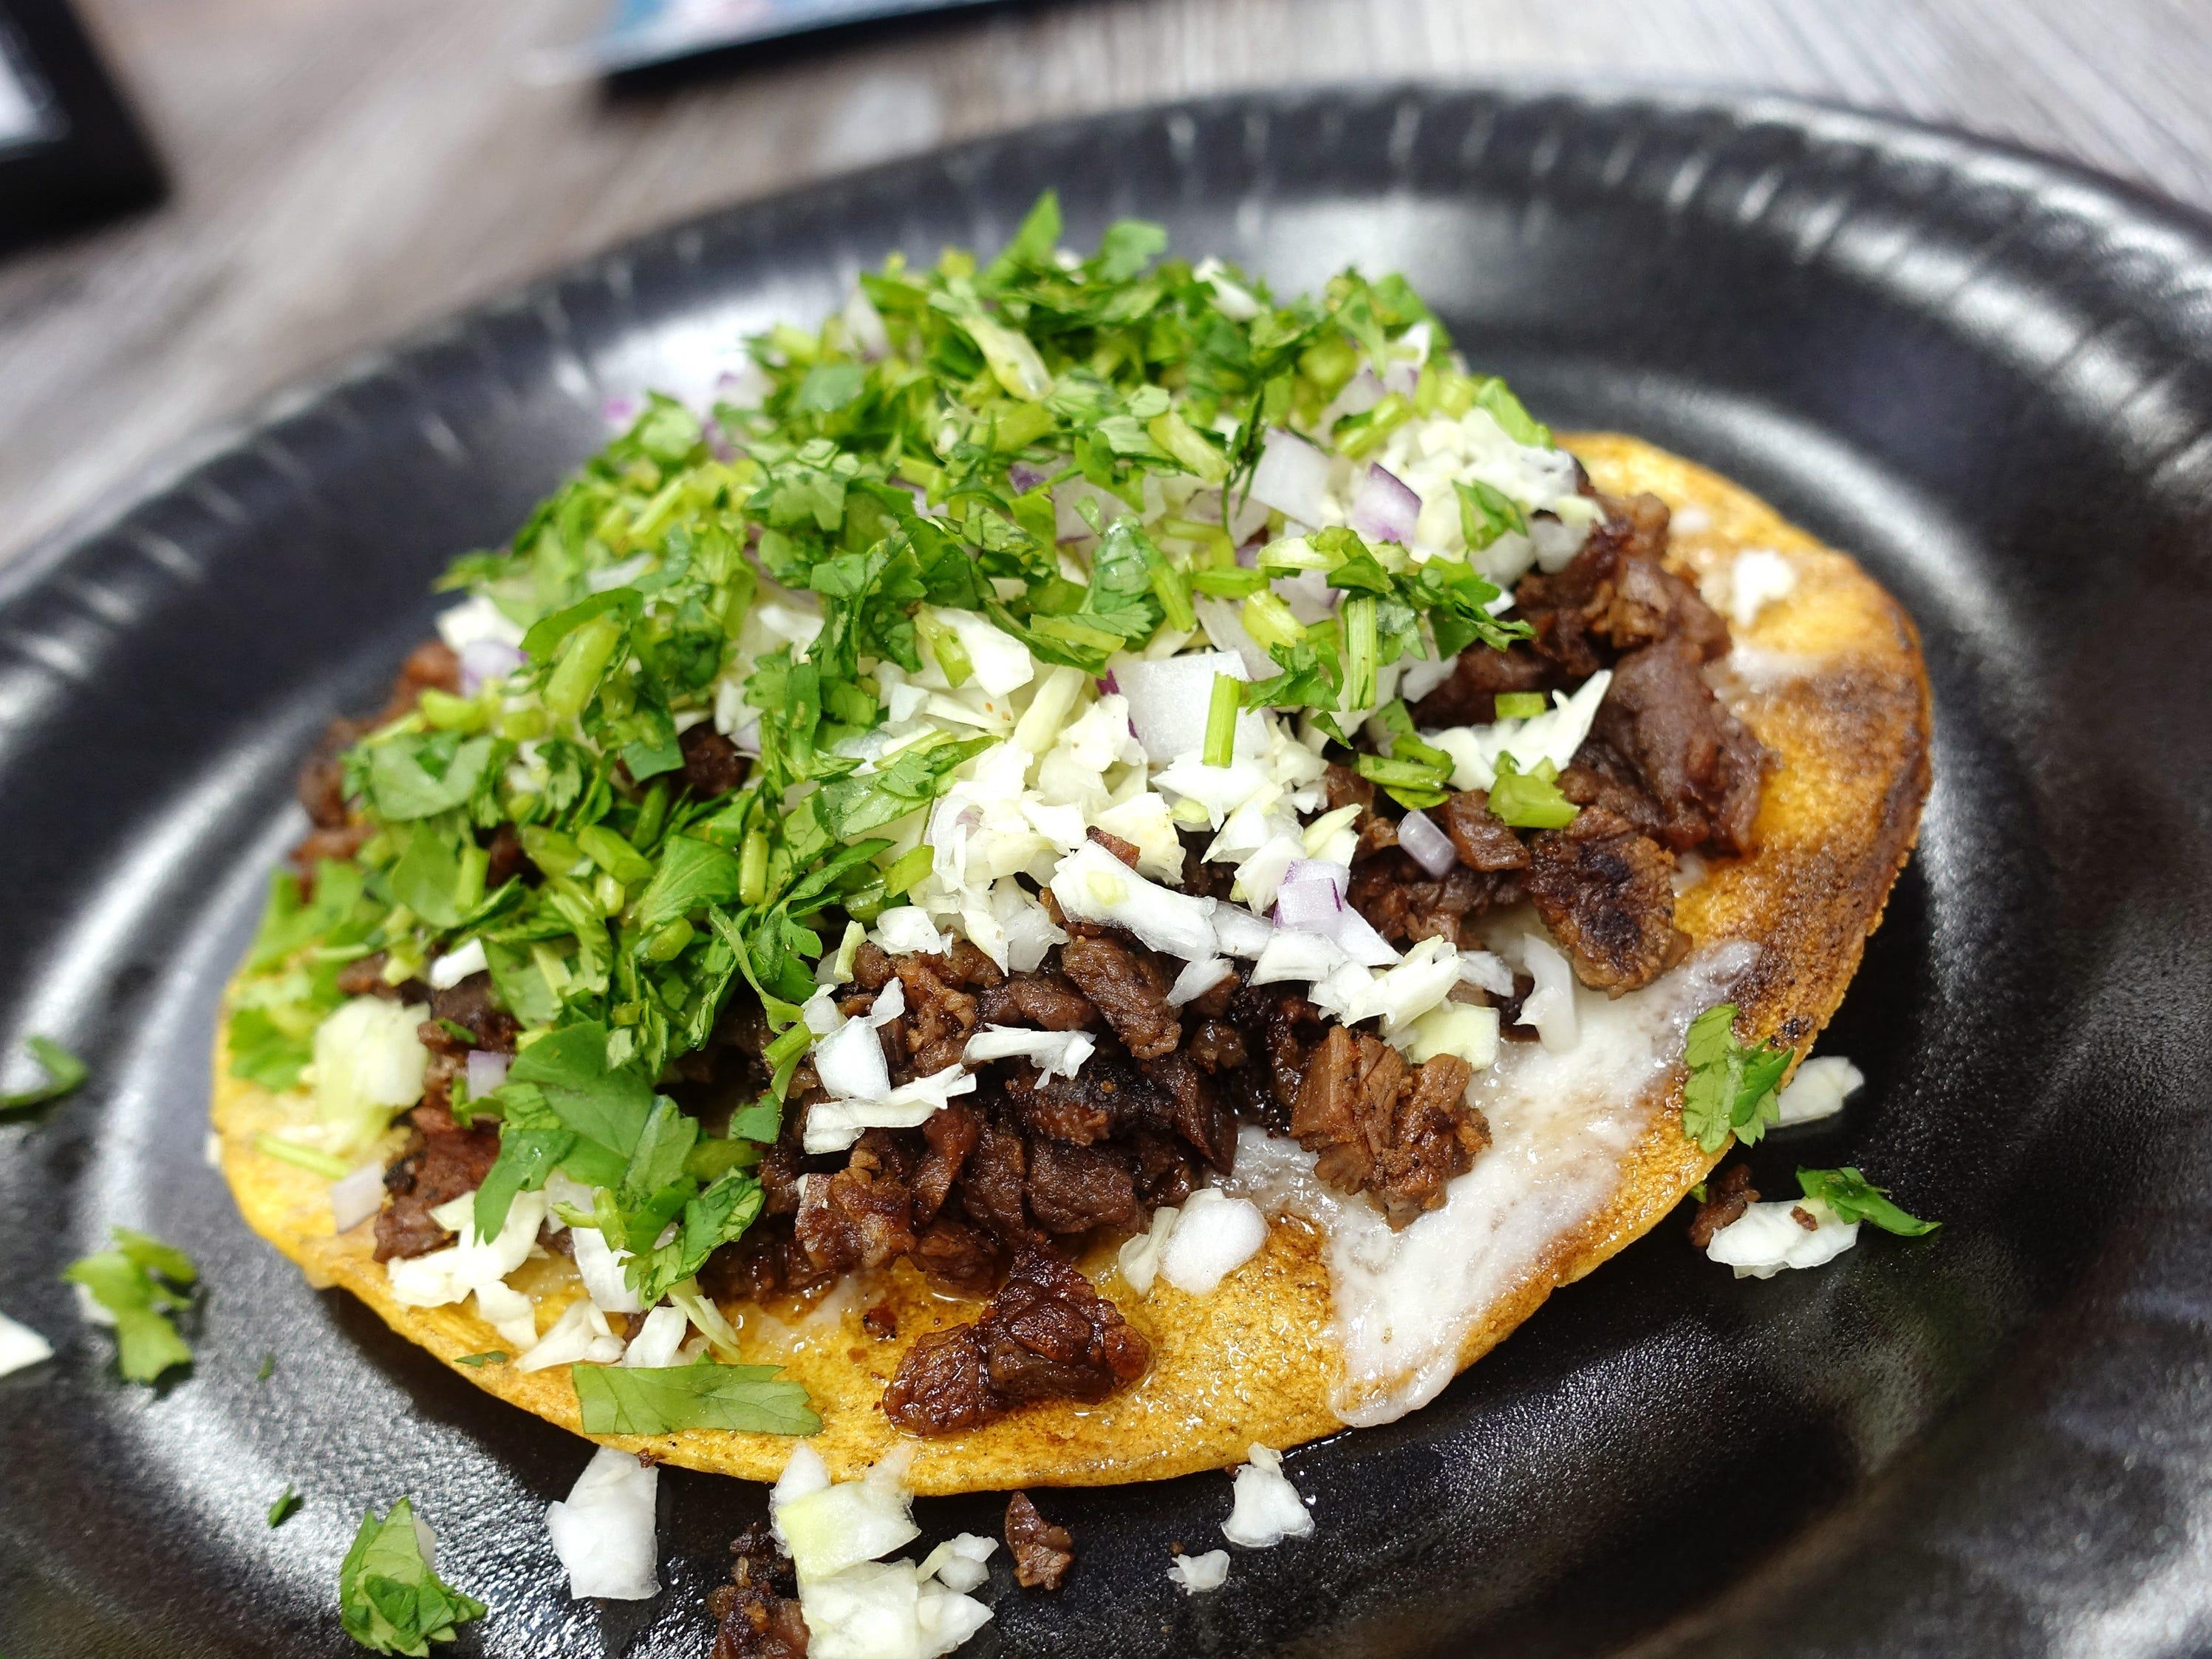 Carne asada vampiro at Tacos Culichi in Phoenix.